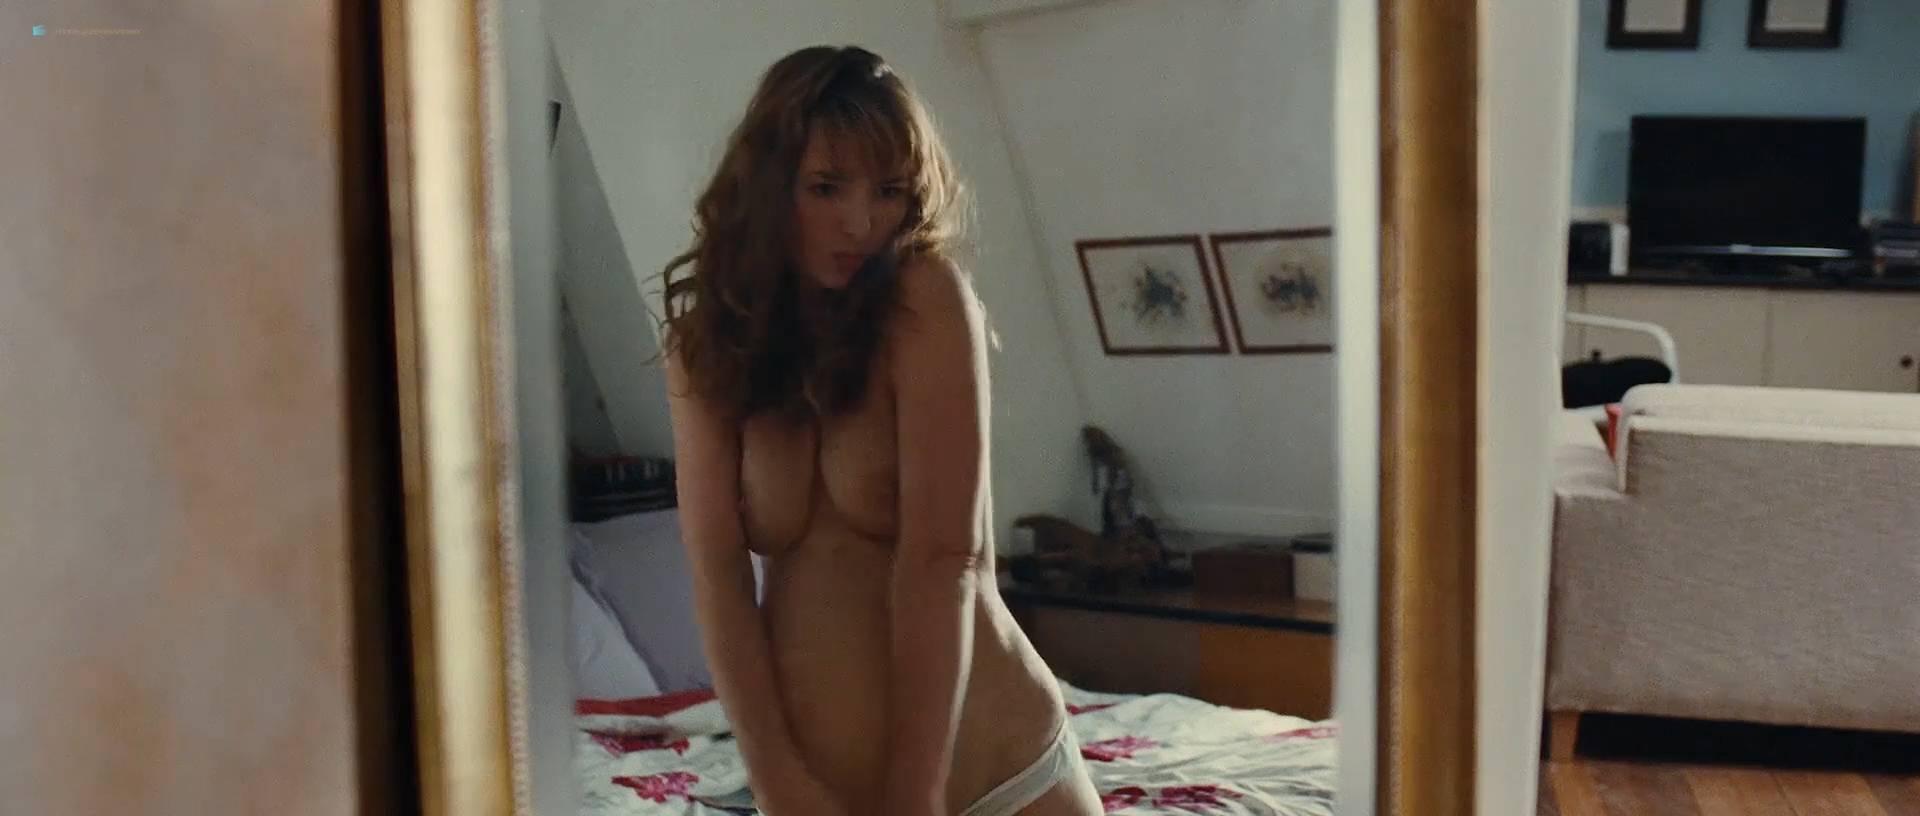 Louise Bourgoin nude and pregnant in - Unheureux événement (FR-2011) HD 1080p (11)